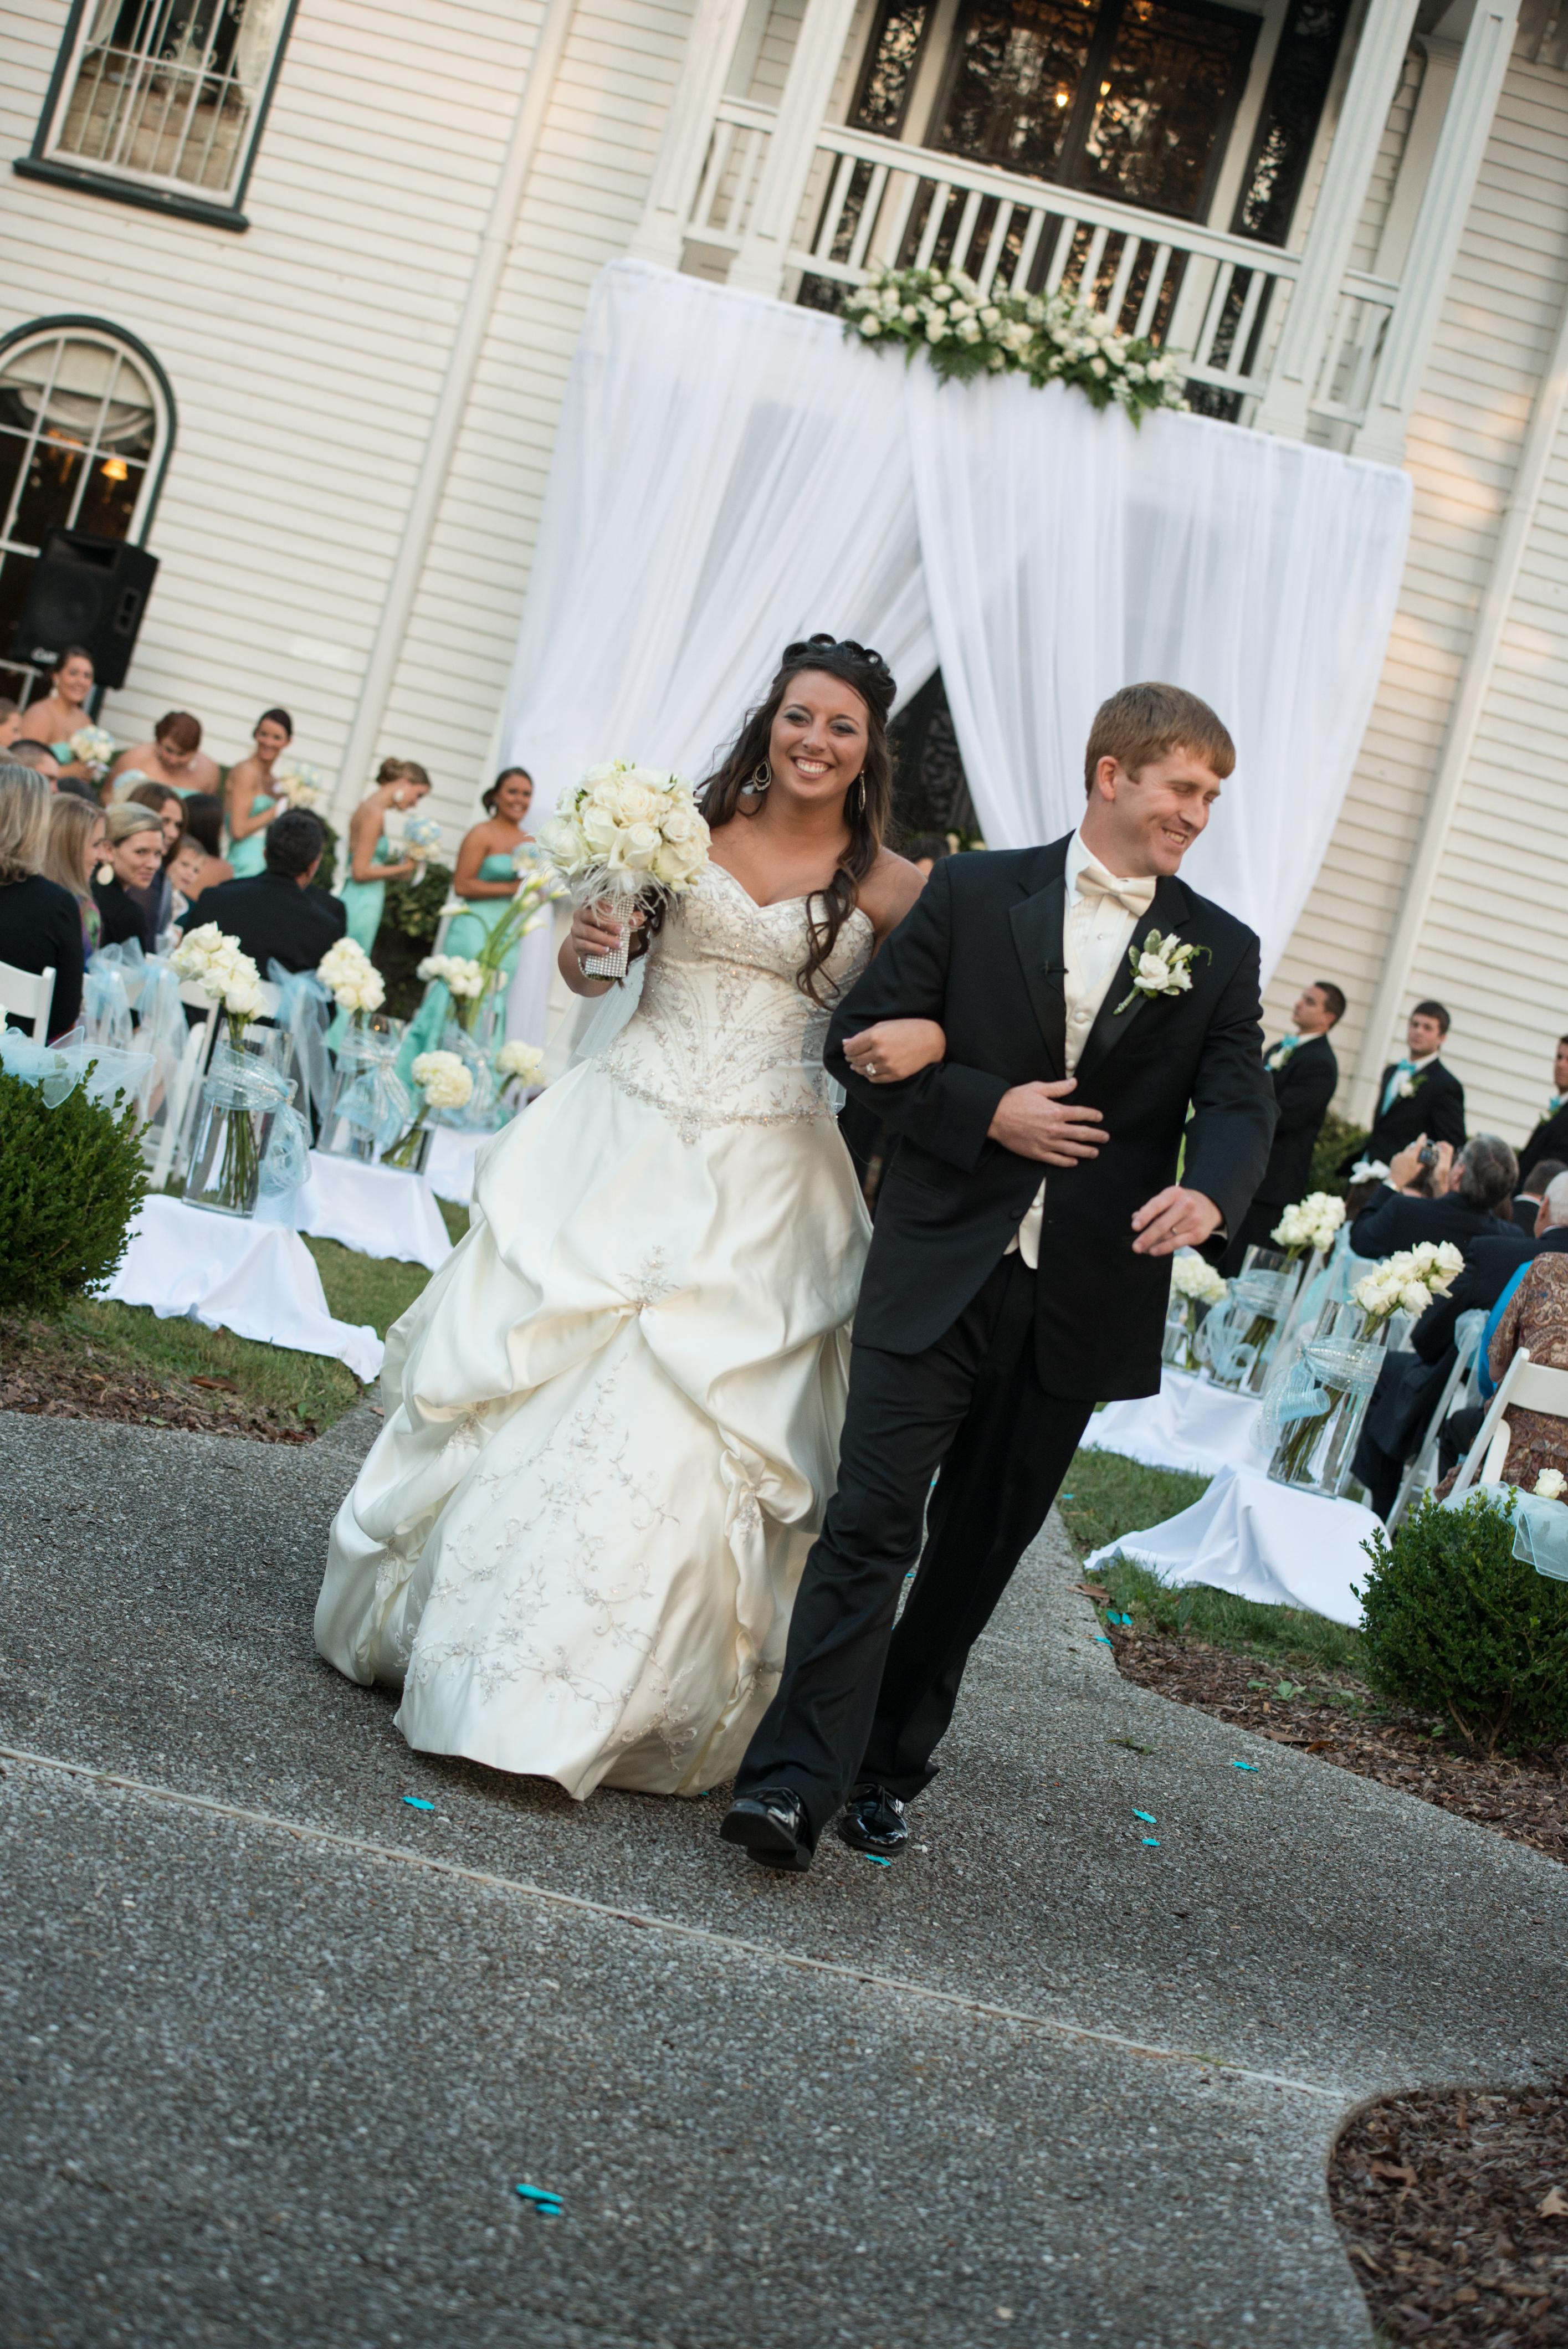 Matt-Blakely-wedding-nashville-tn-legacy-farms-937